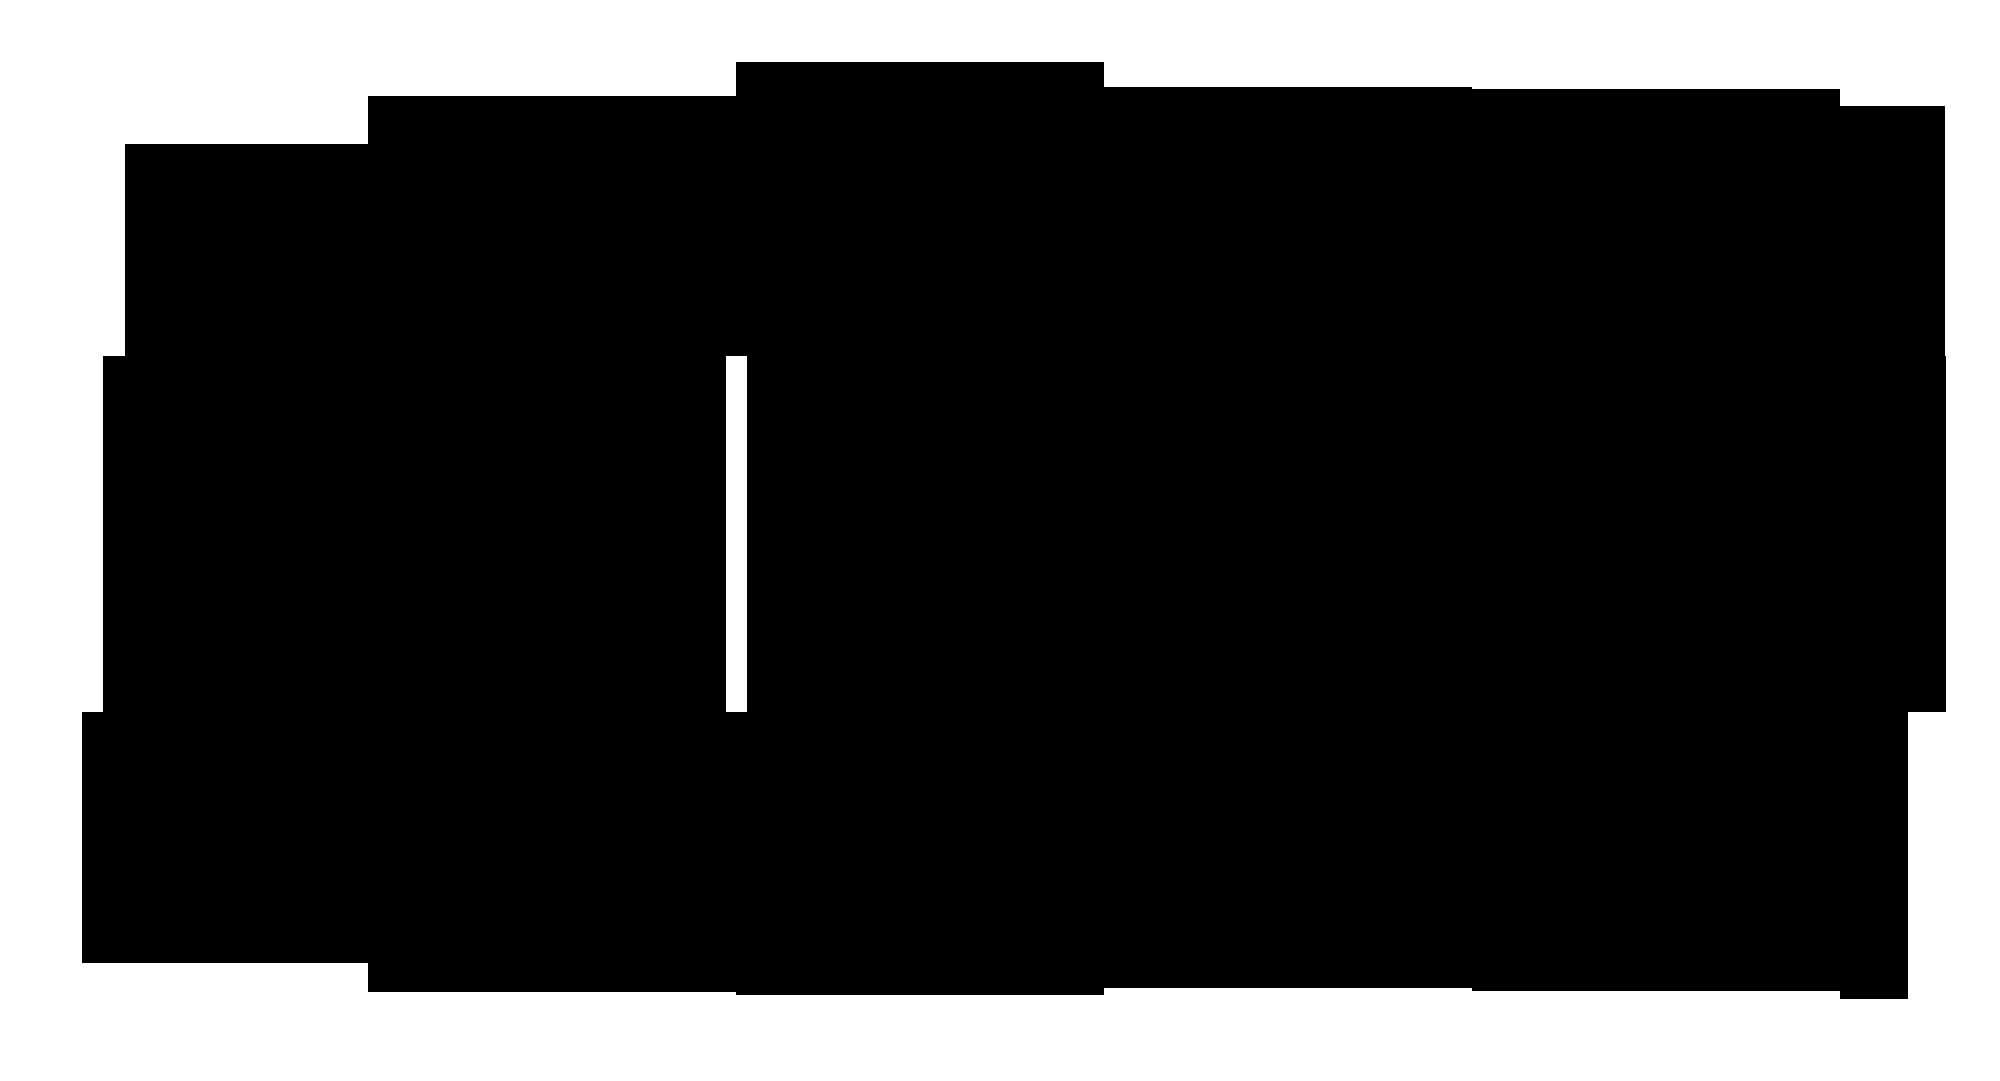 minze_logo positiv 1